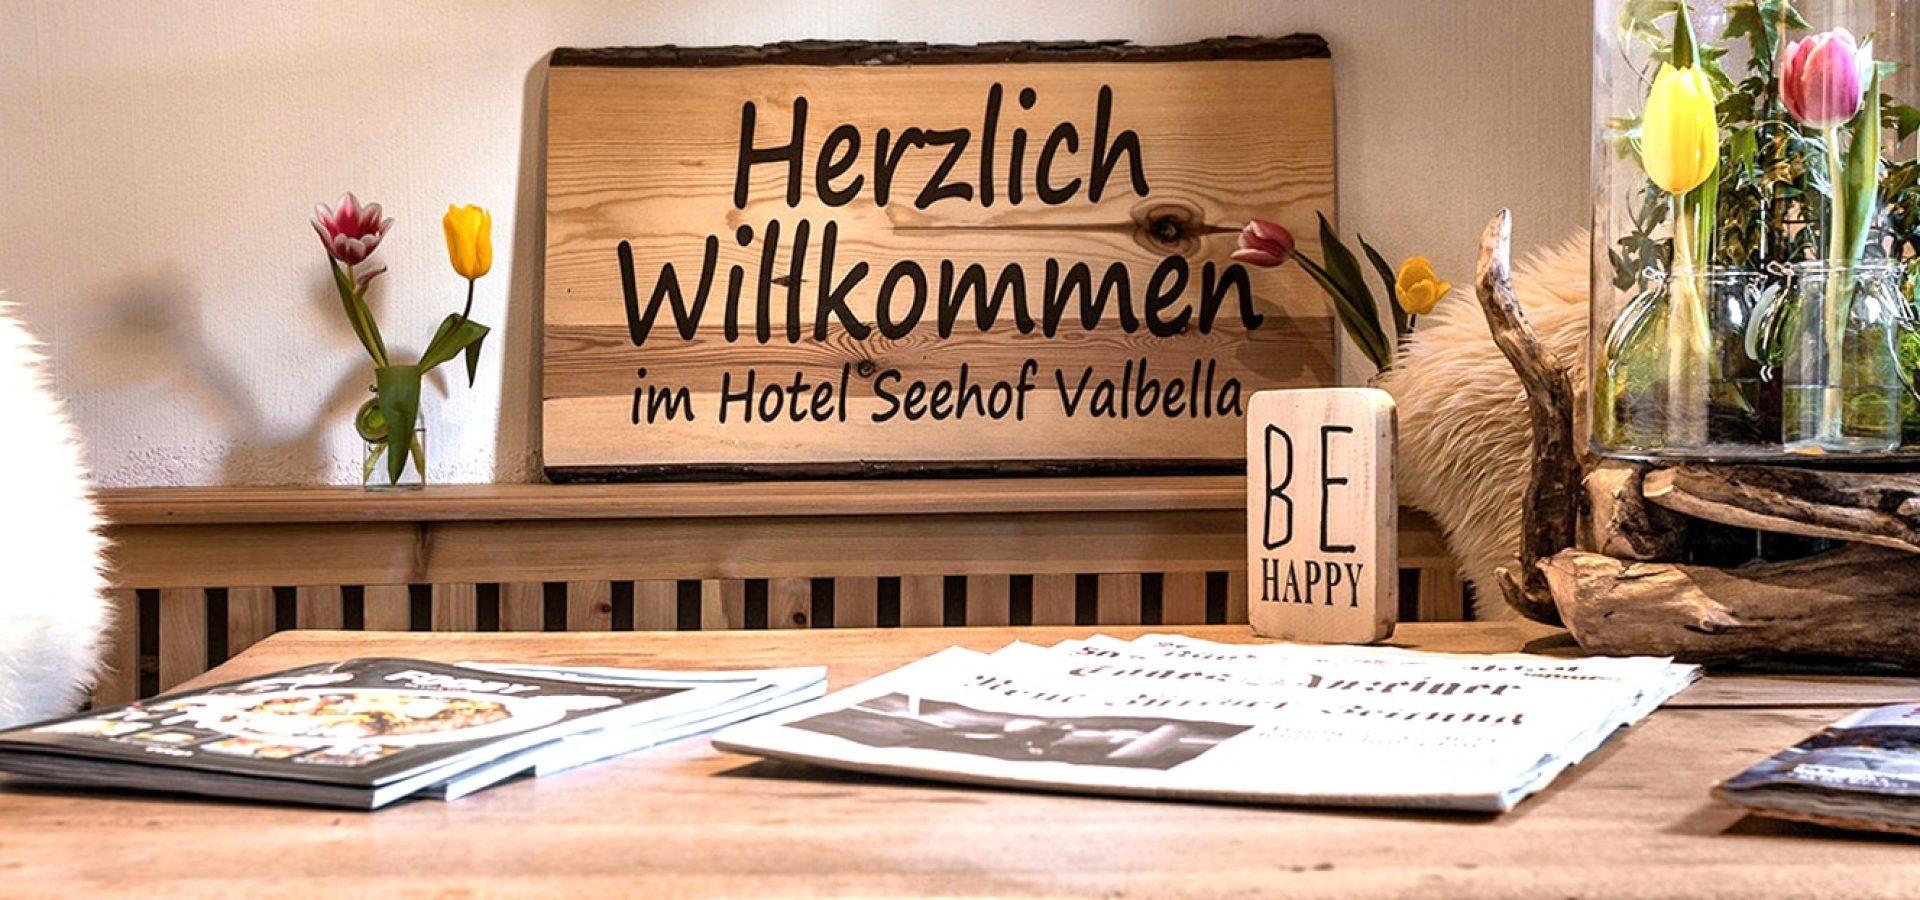 seehof-valbella-welcome-schmal